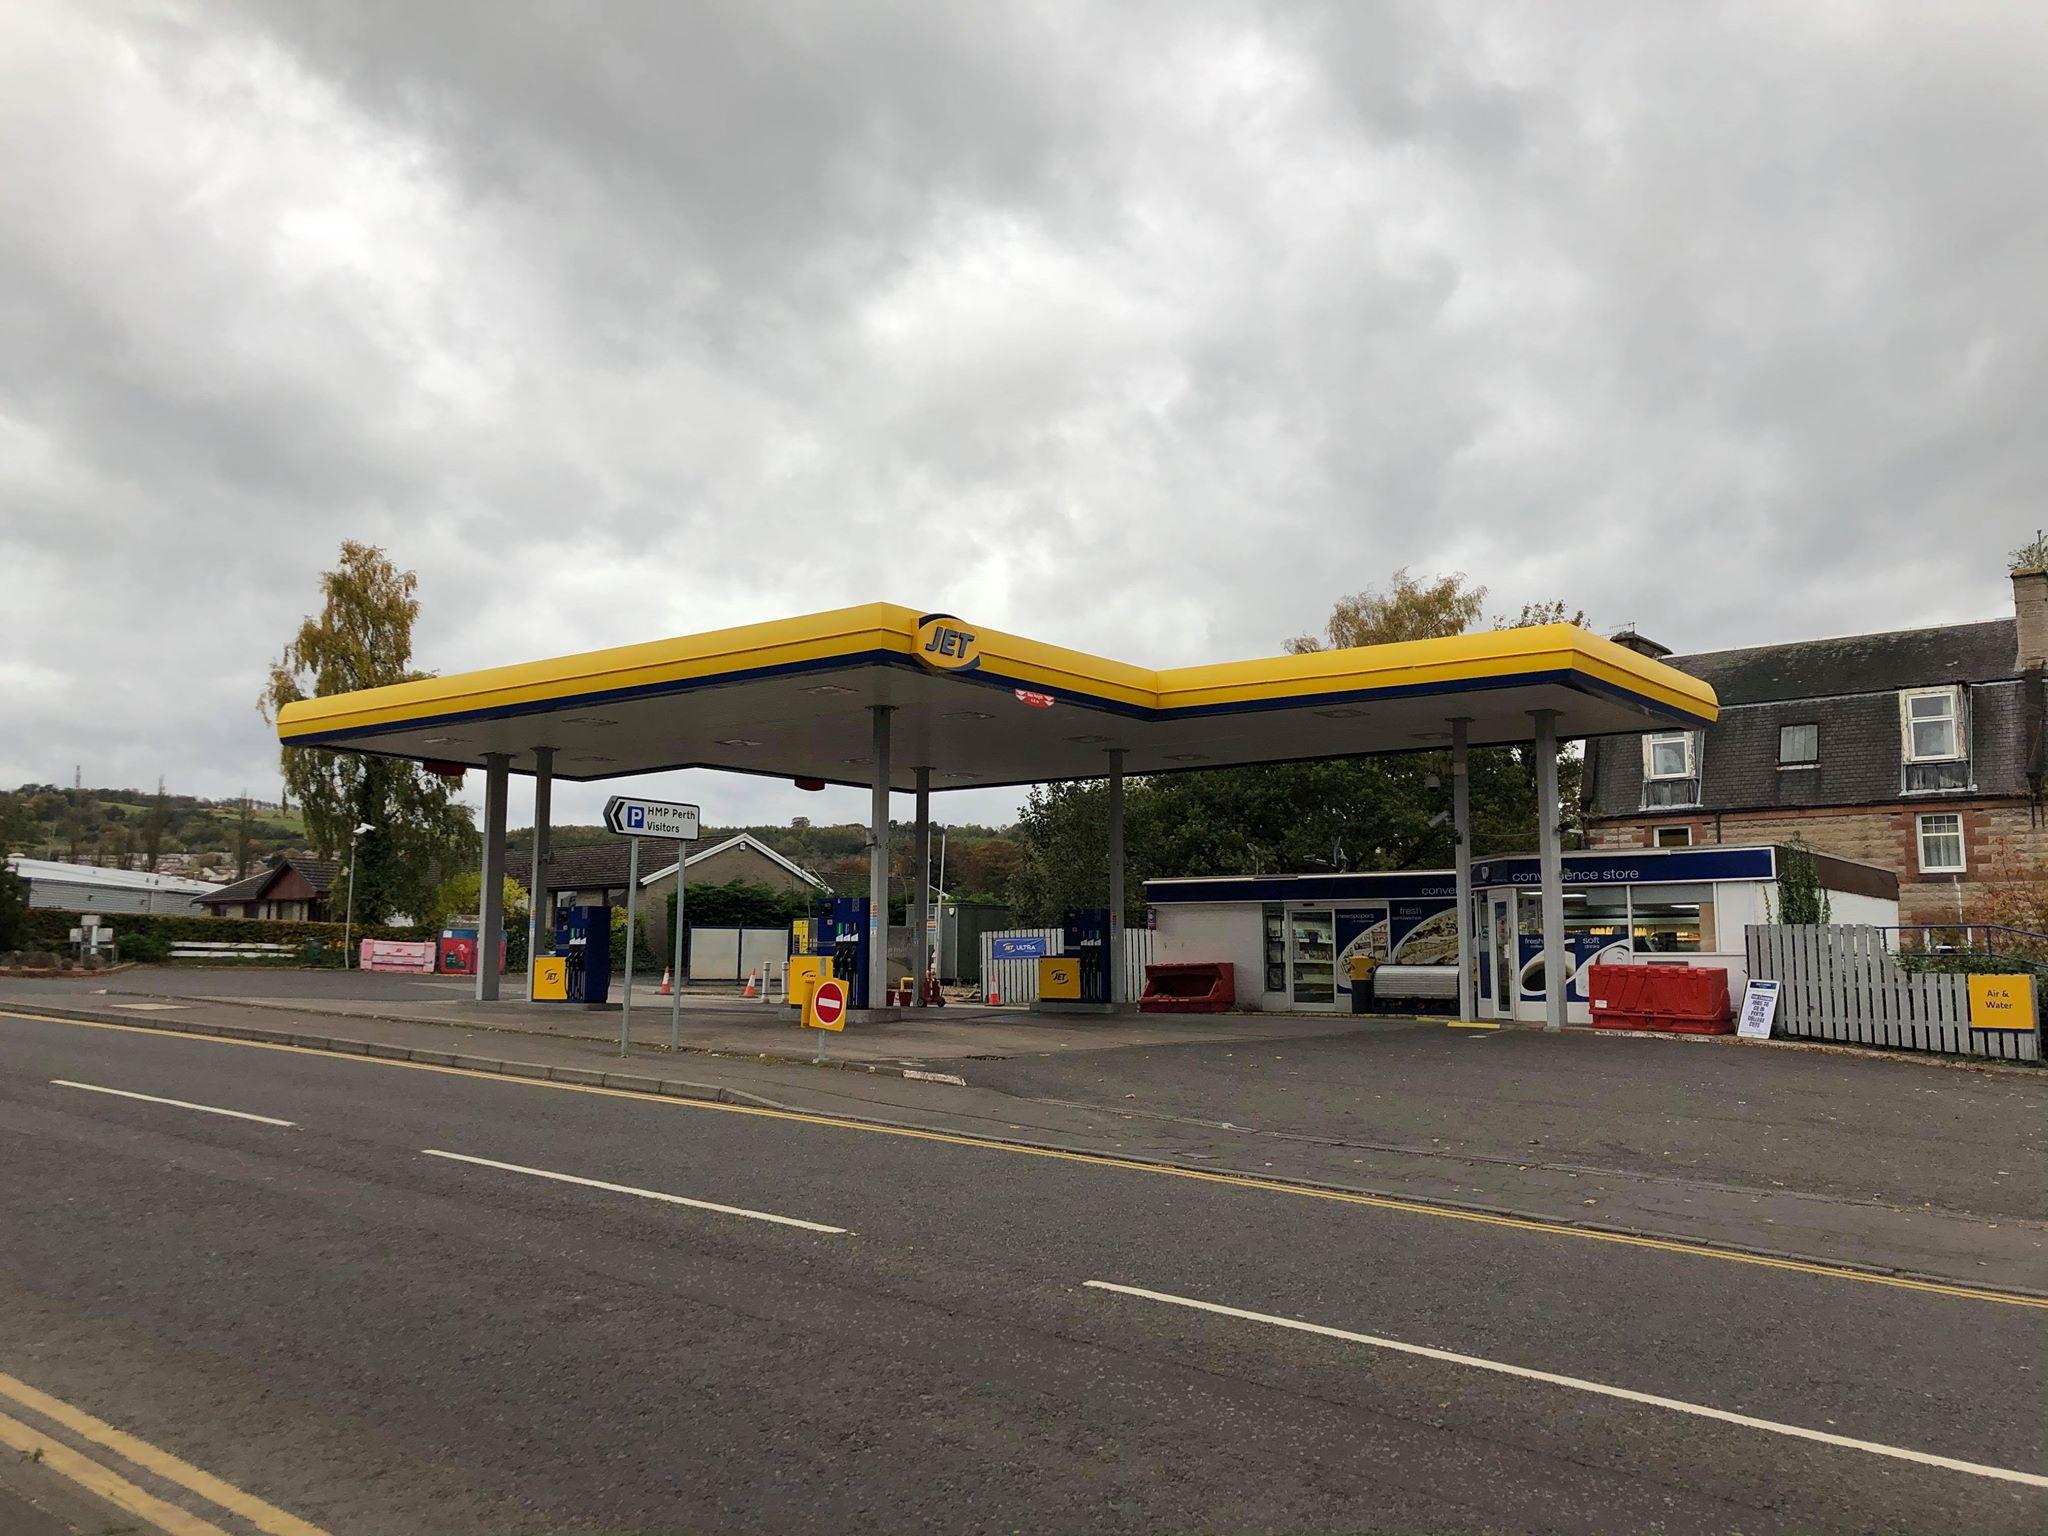 Jet petrol station in Perth